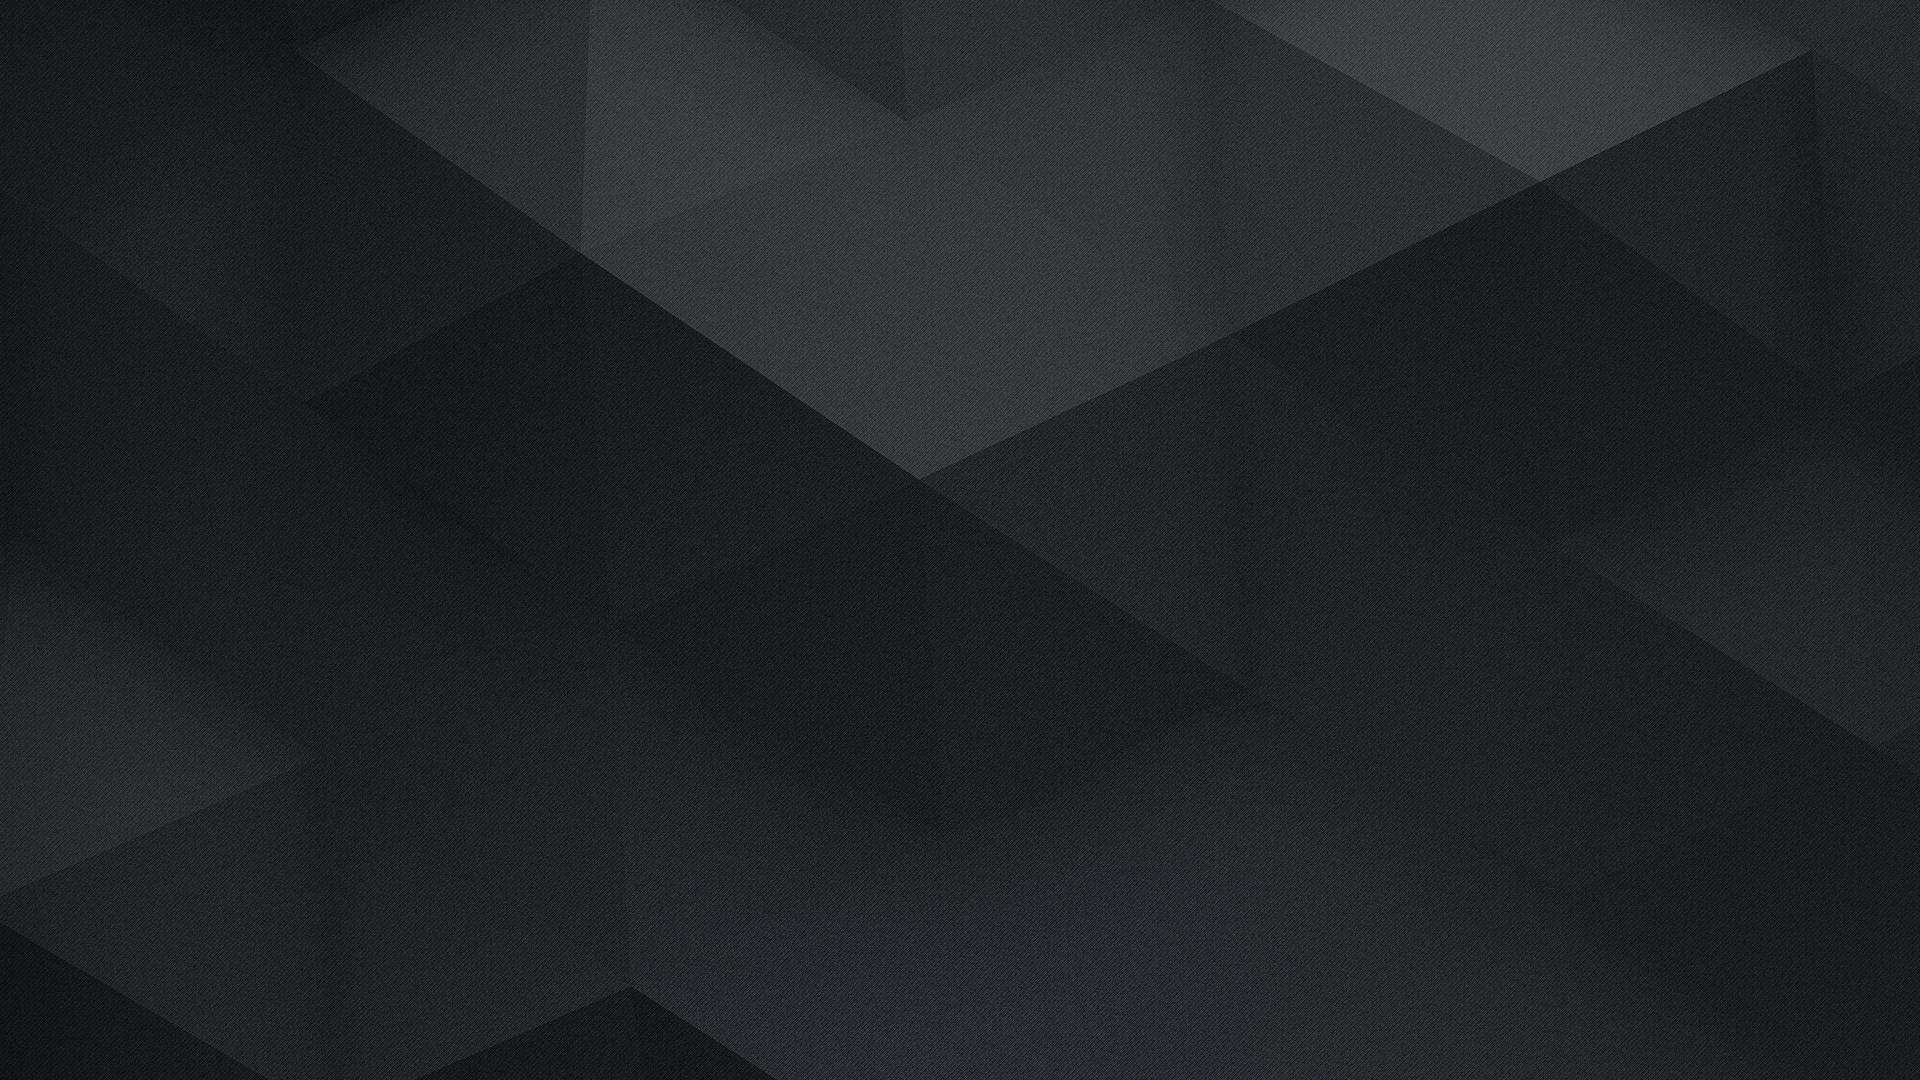 Free Download 1920x1080 Black Minimalistic Geometry Desktop Pc And